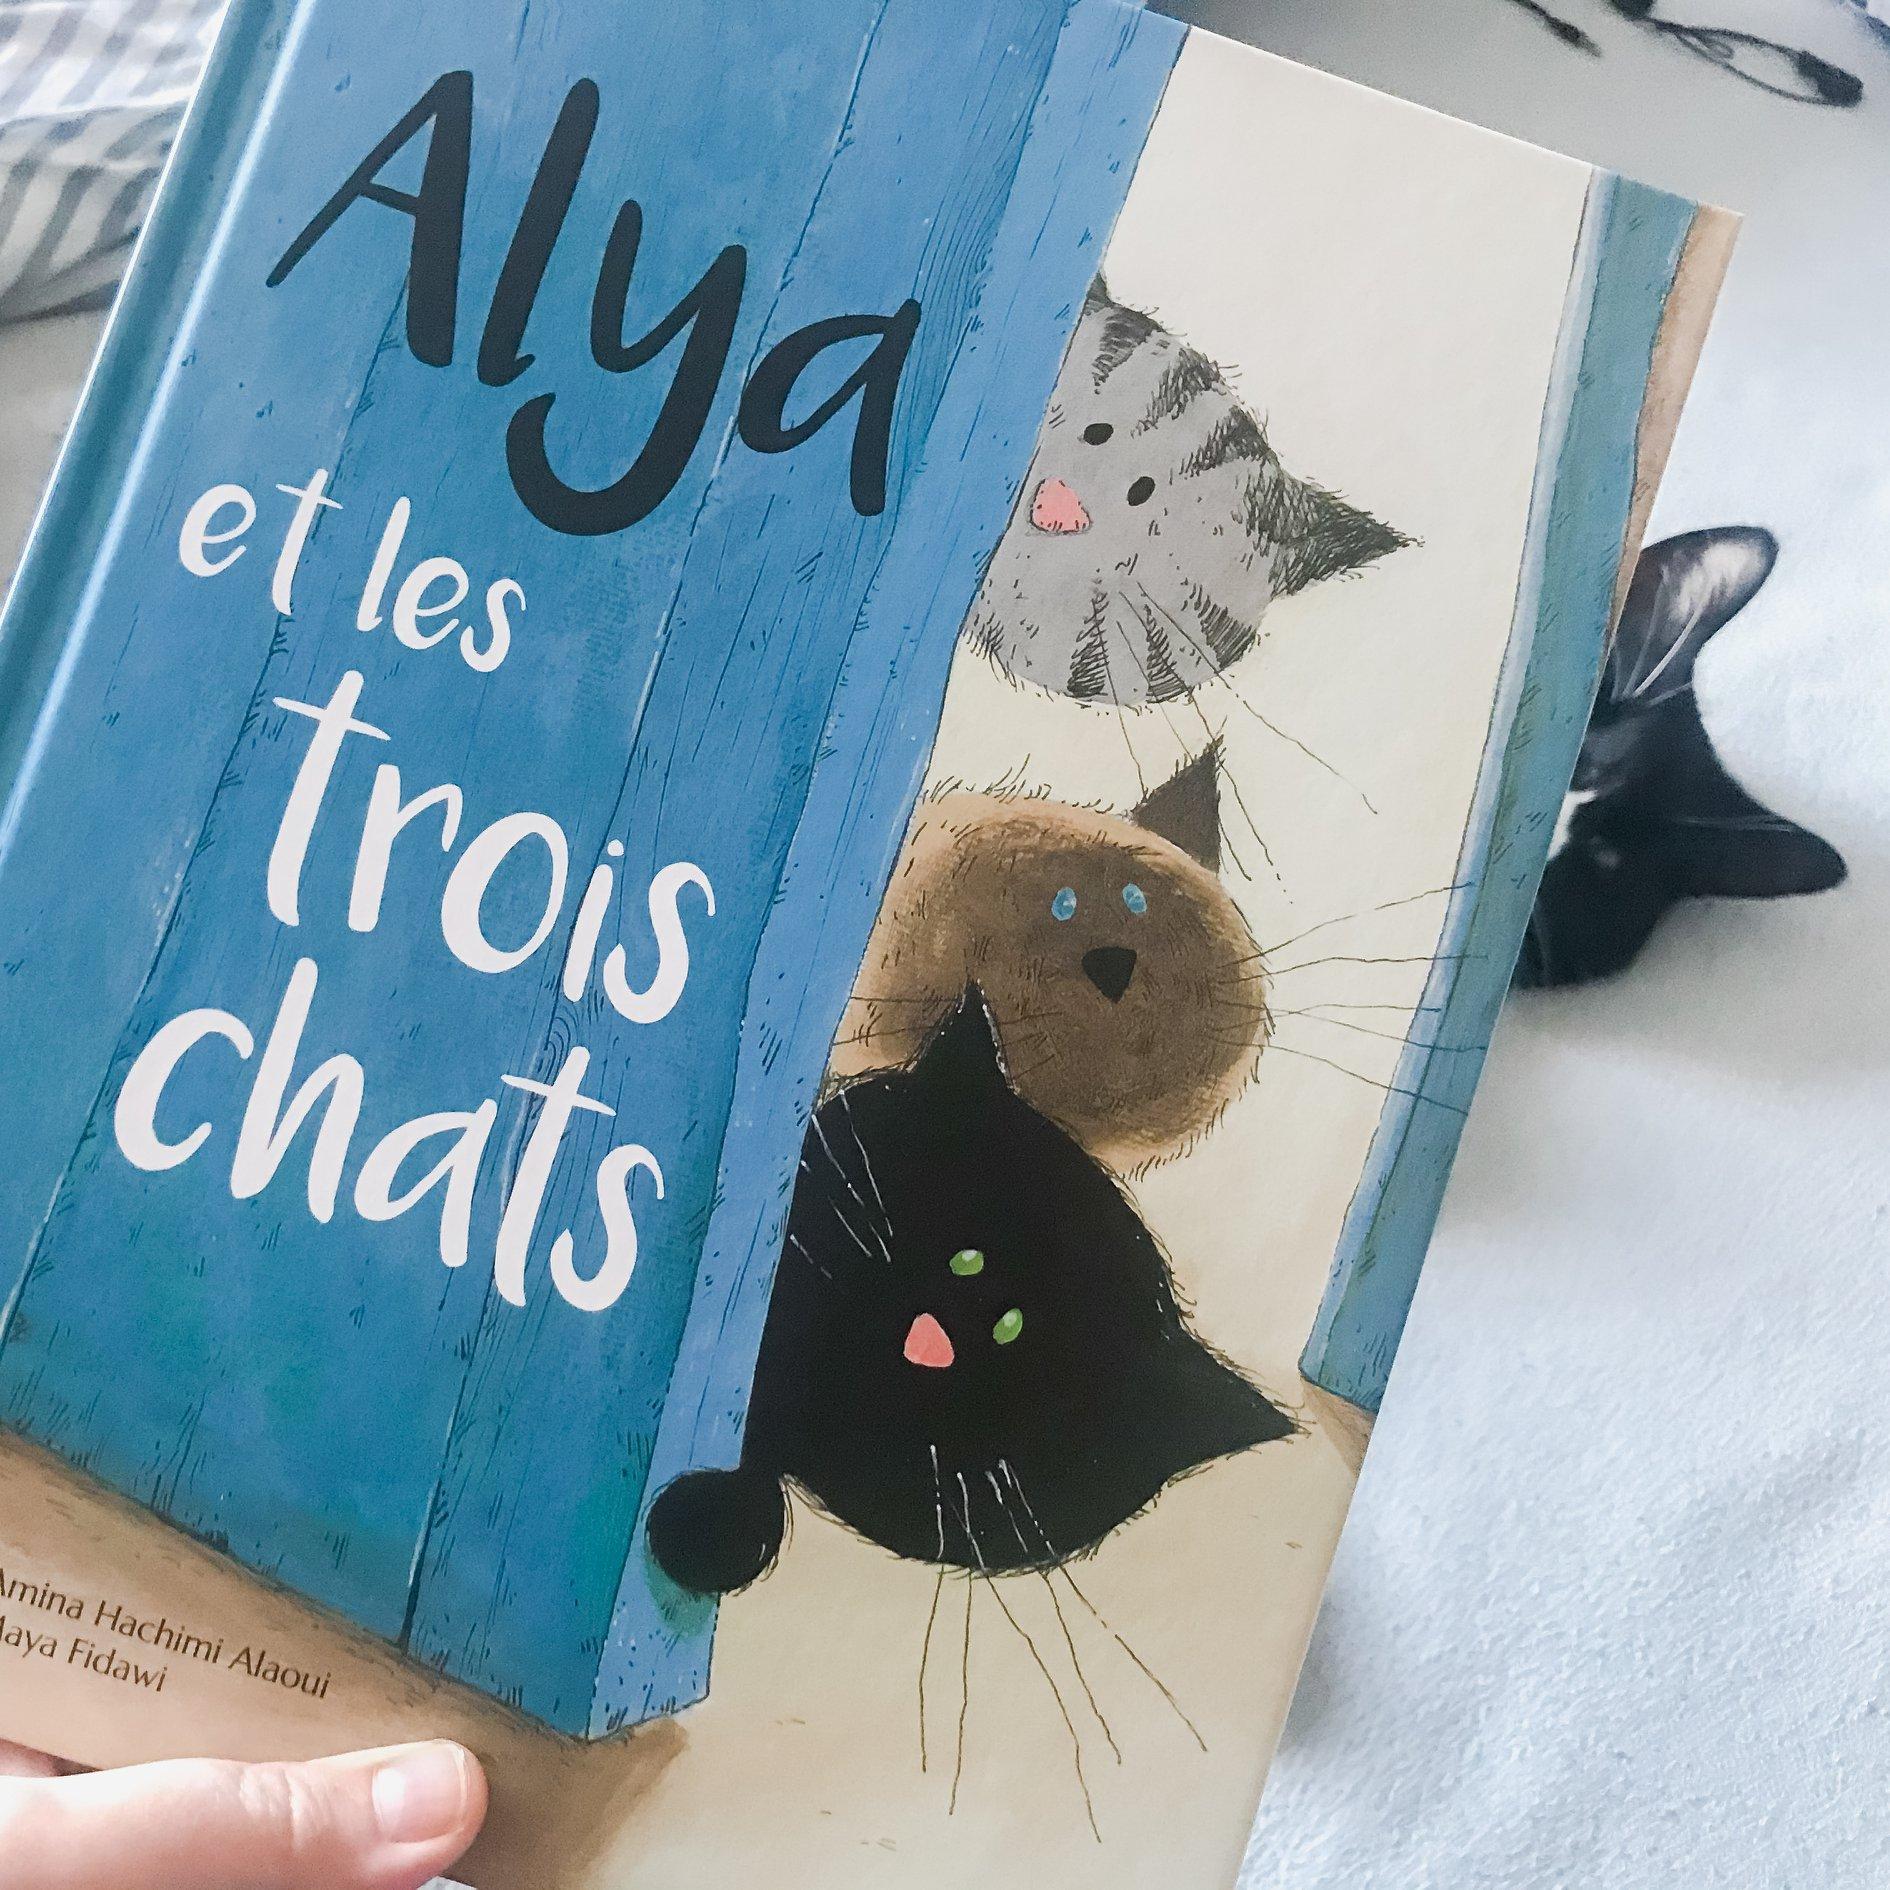 ALYA ET LES TROIS CHATS (Crackboom)